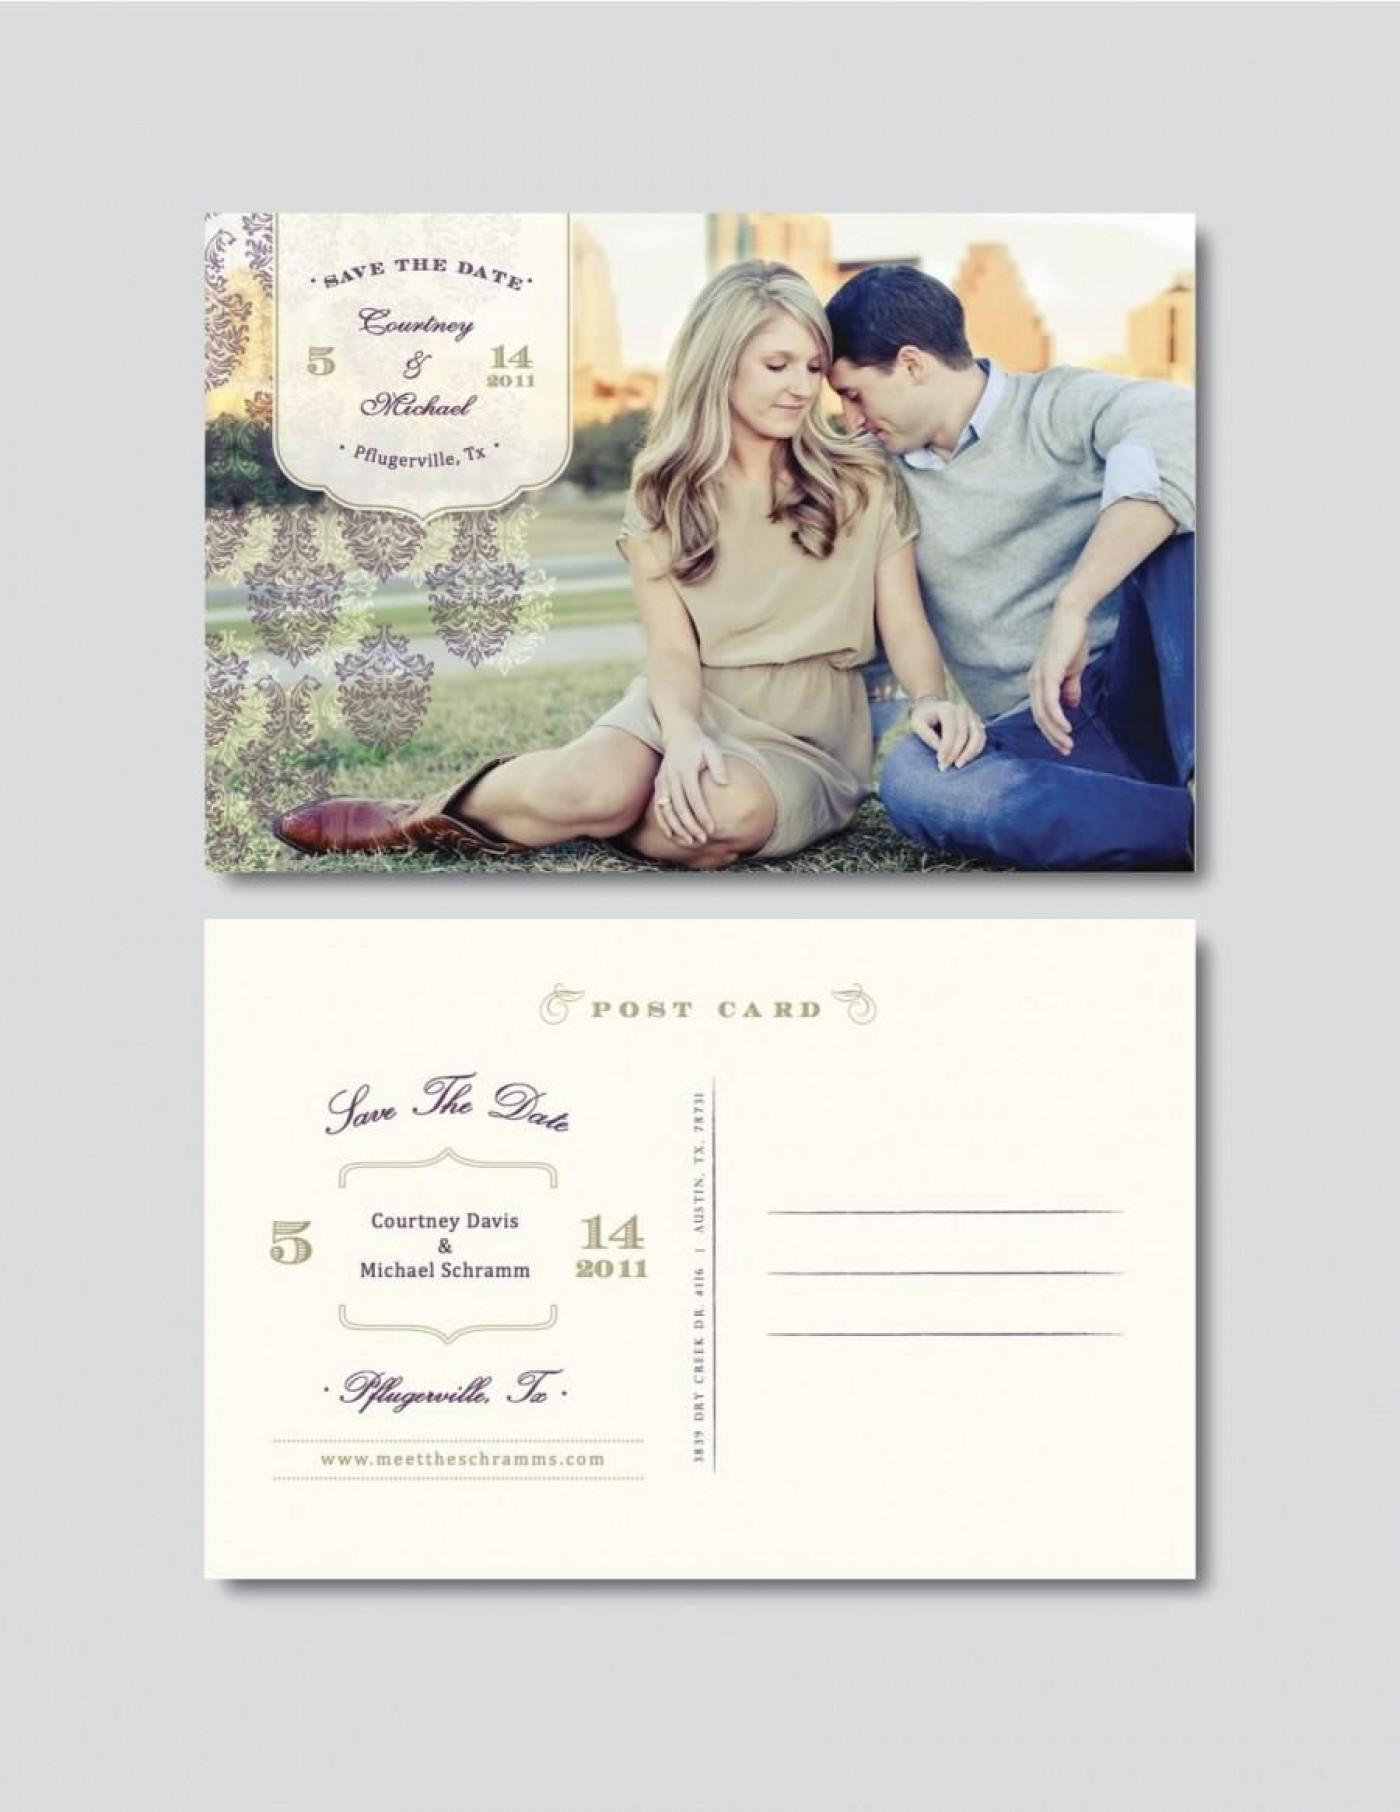 009 Surprising Save The Date Postcard Template Photo  Diy Free Birthday1400